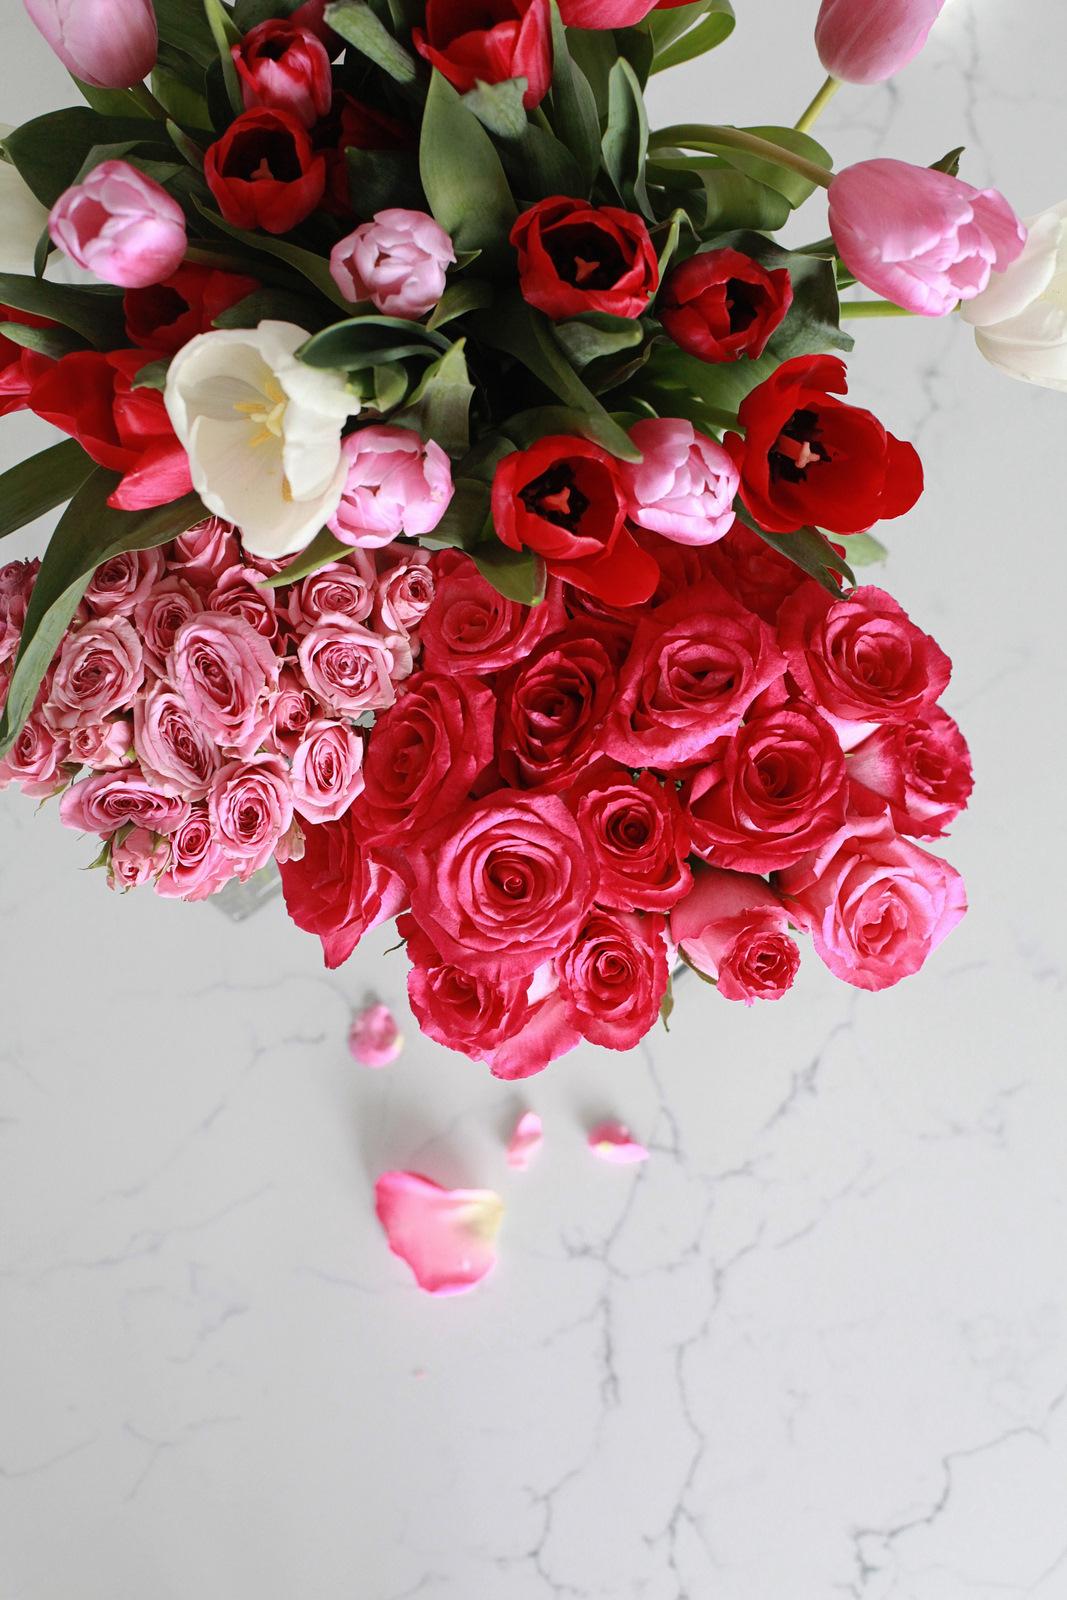 Spring flowers, posh blooms, valentine